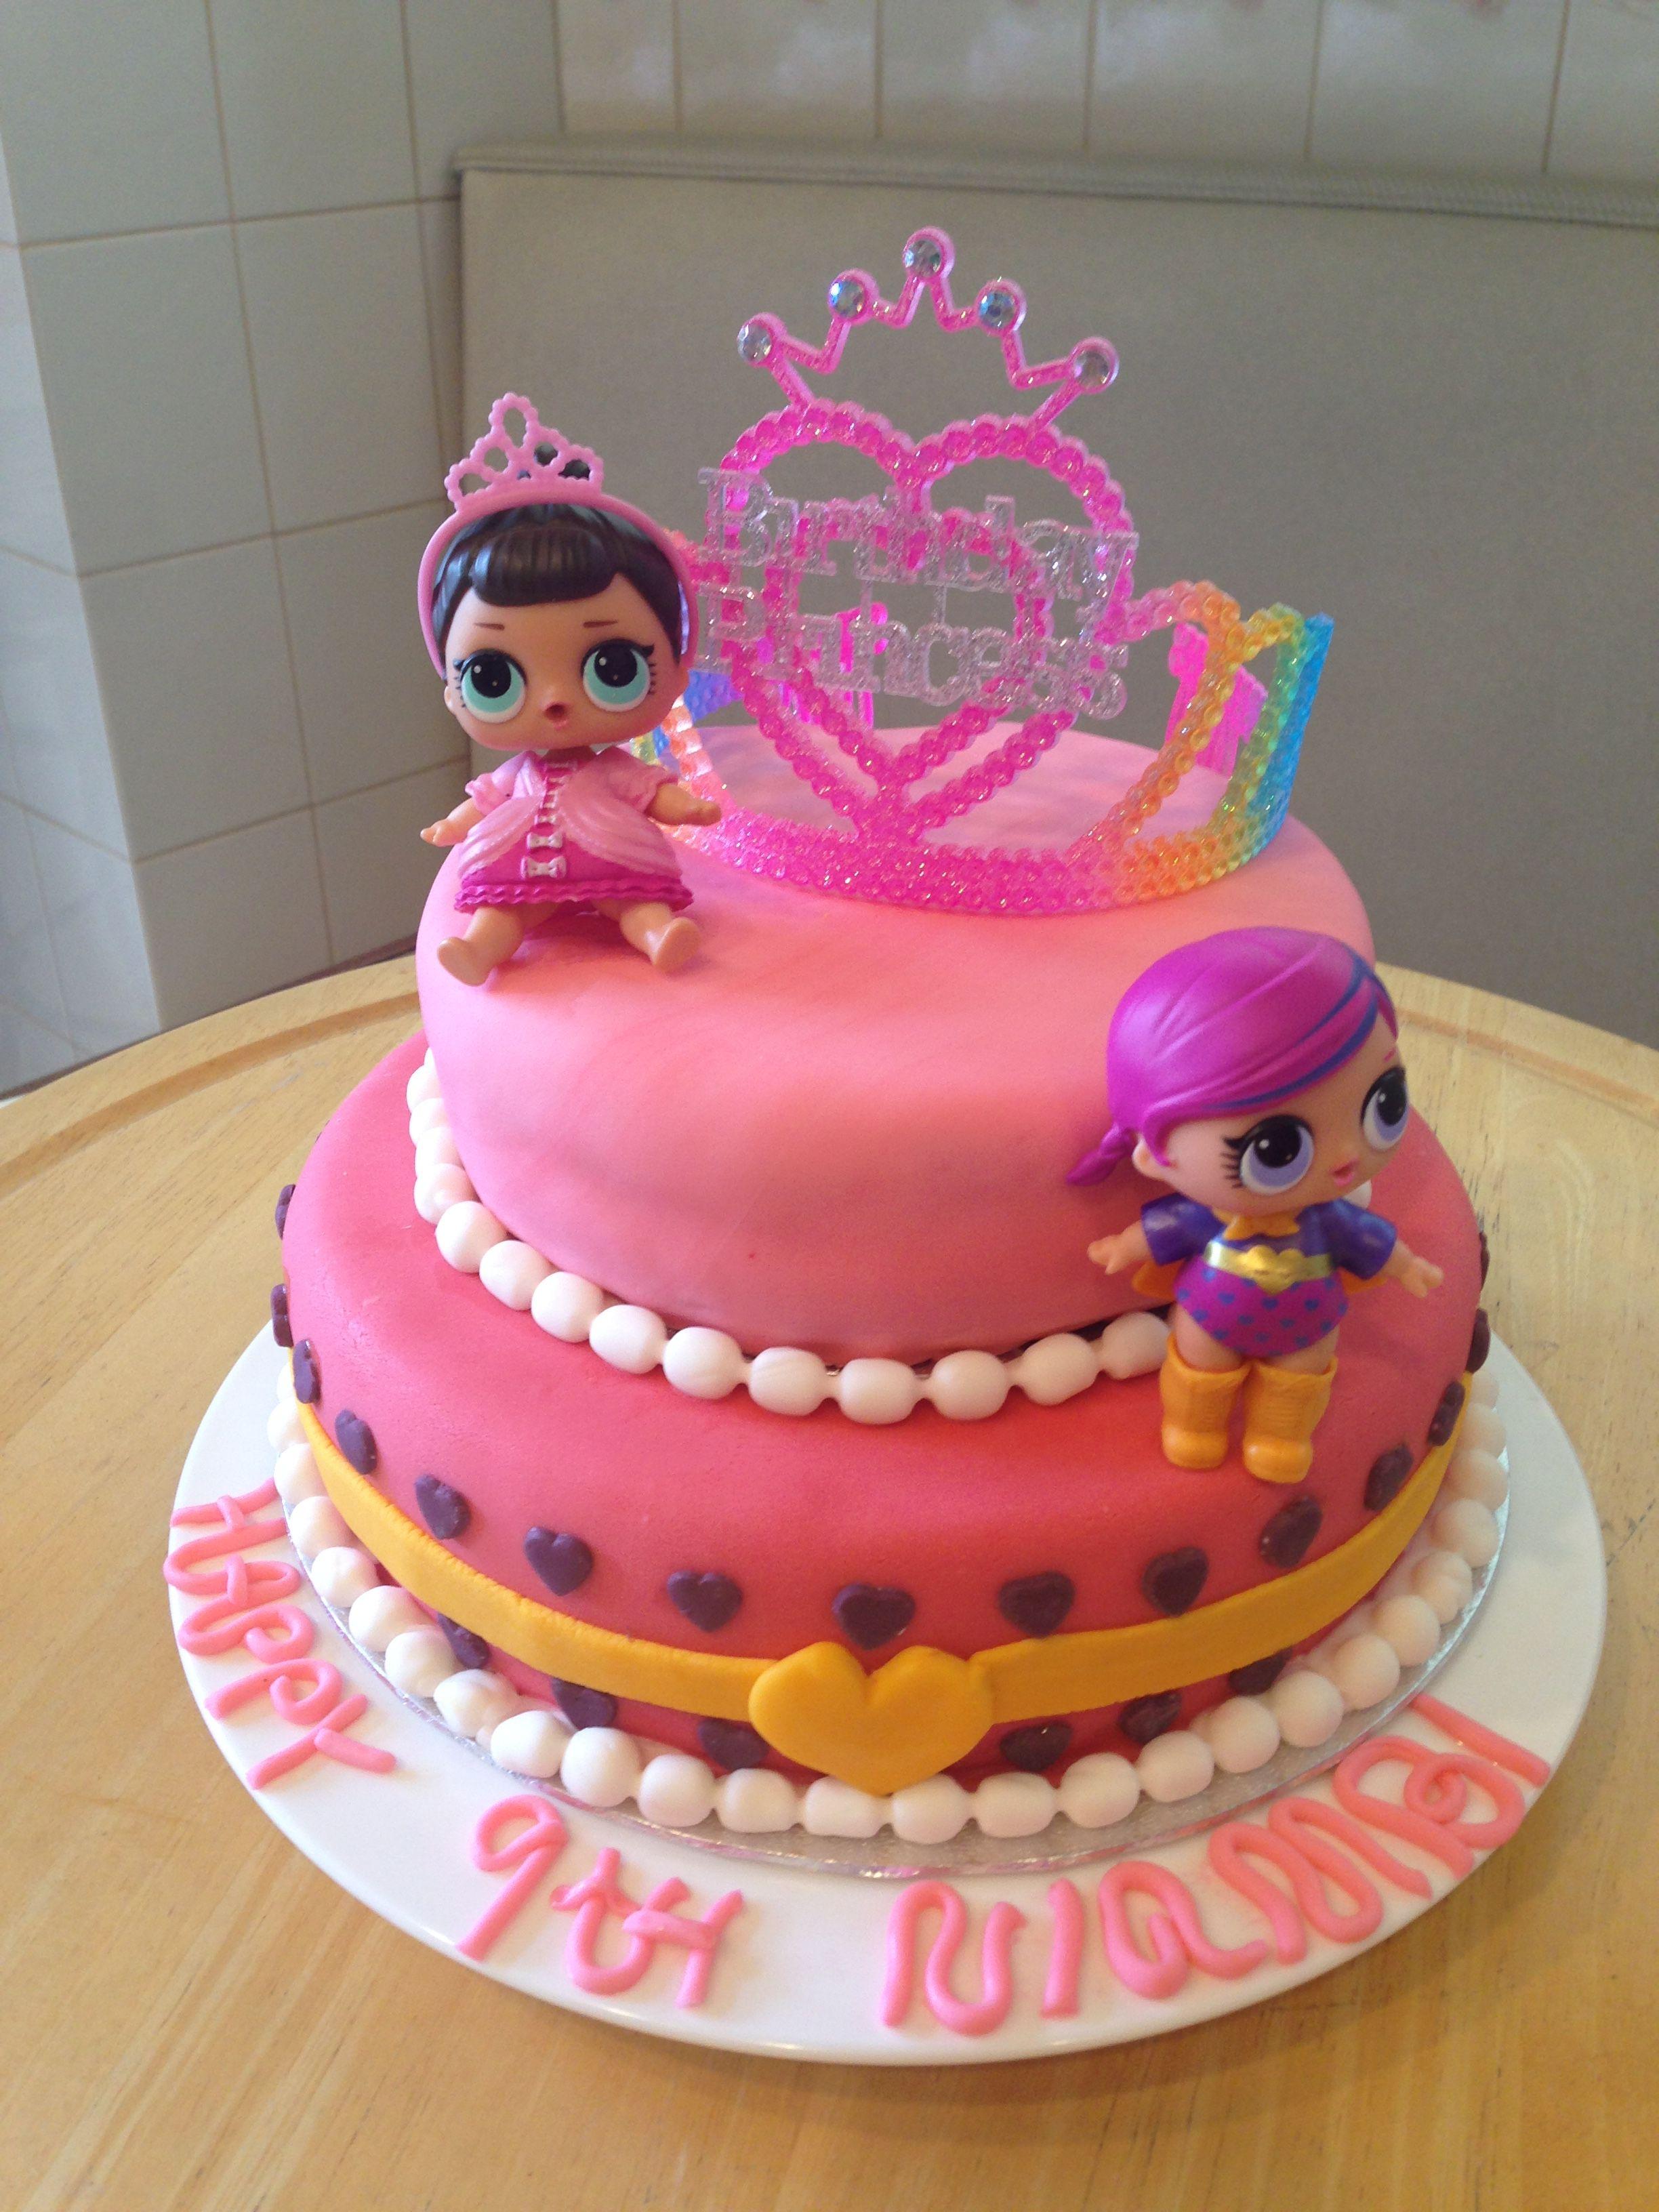 Lol surprise doll birthday cake lol dolls theme party